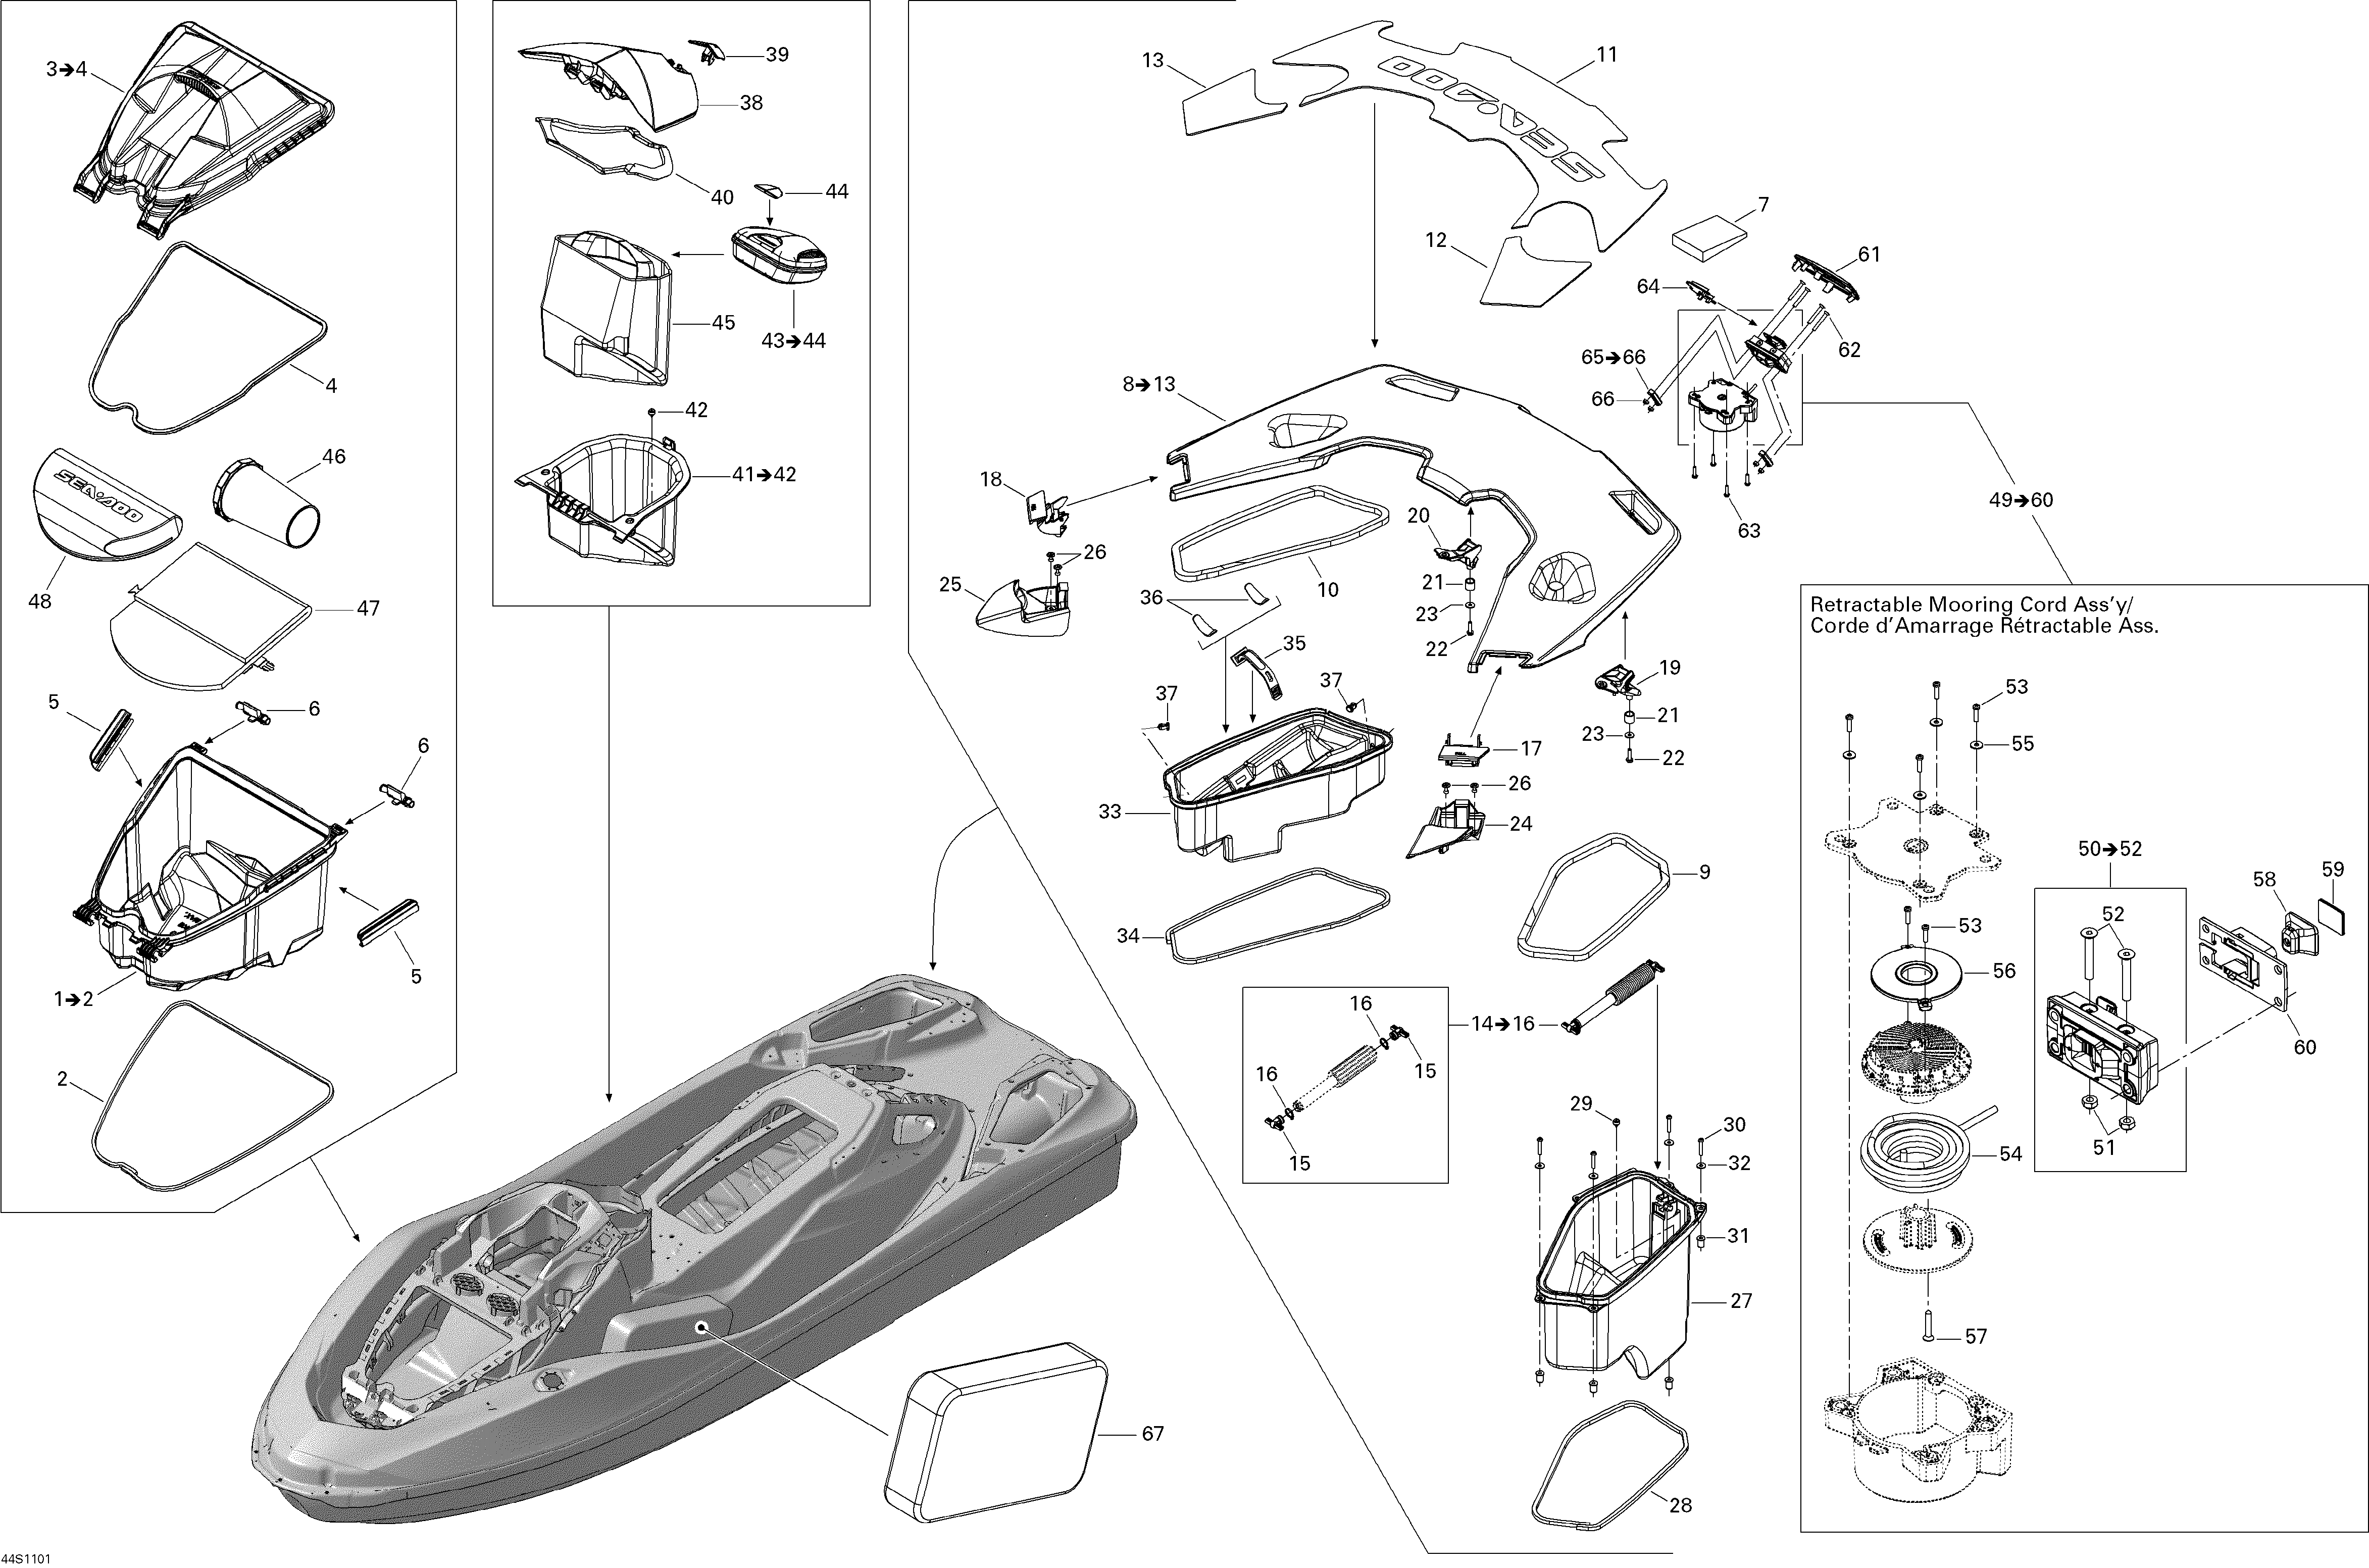 Can-Am,Sea Doo , GTX / GTX-LTD / RXT / RXT-X, Storage